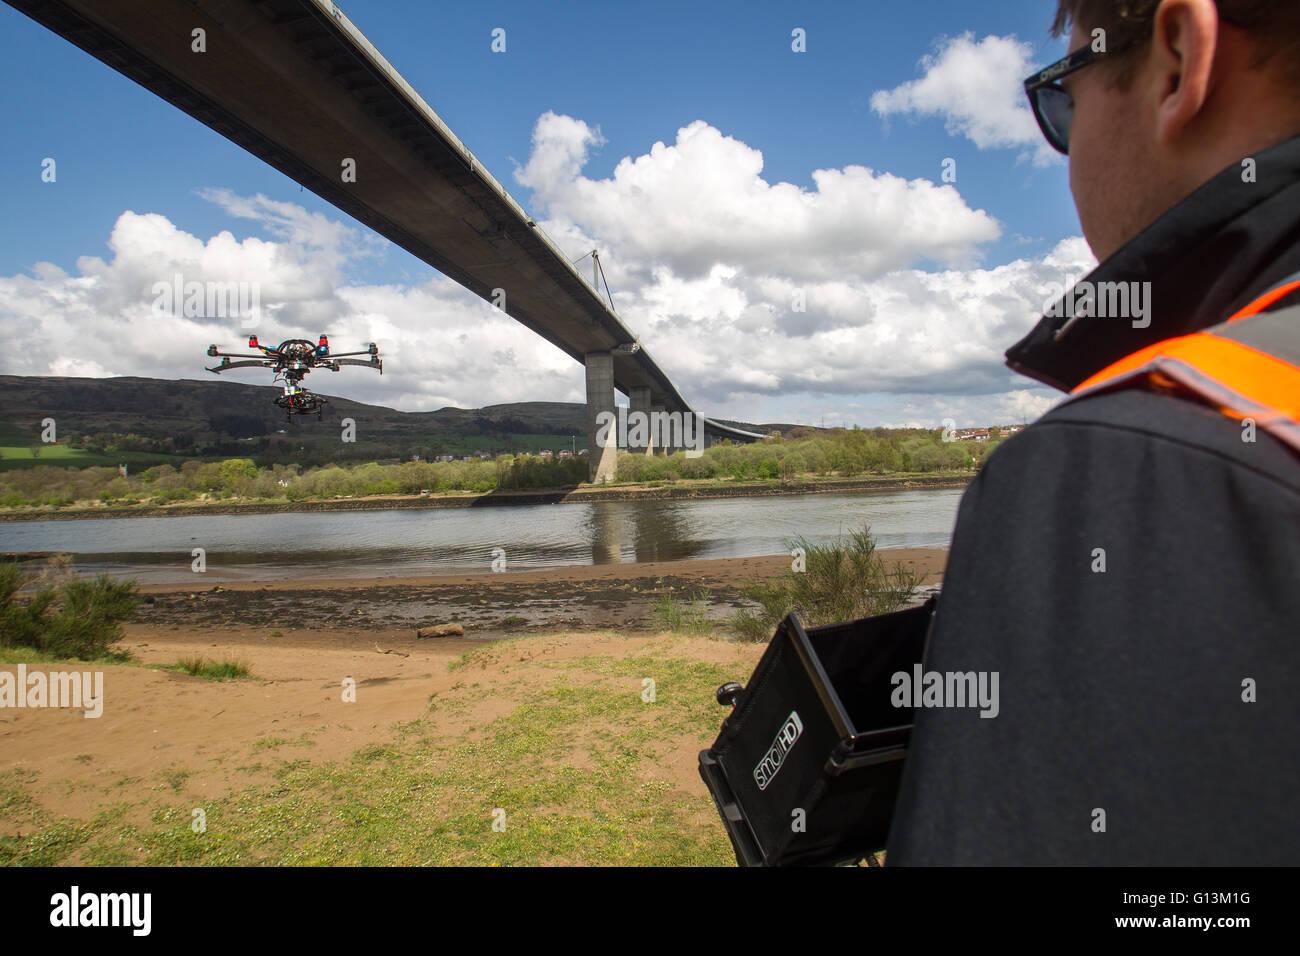 Drone flying next to Erskine Bridge Stock Photo